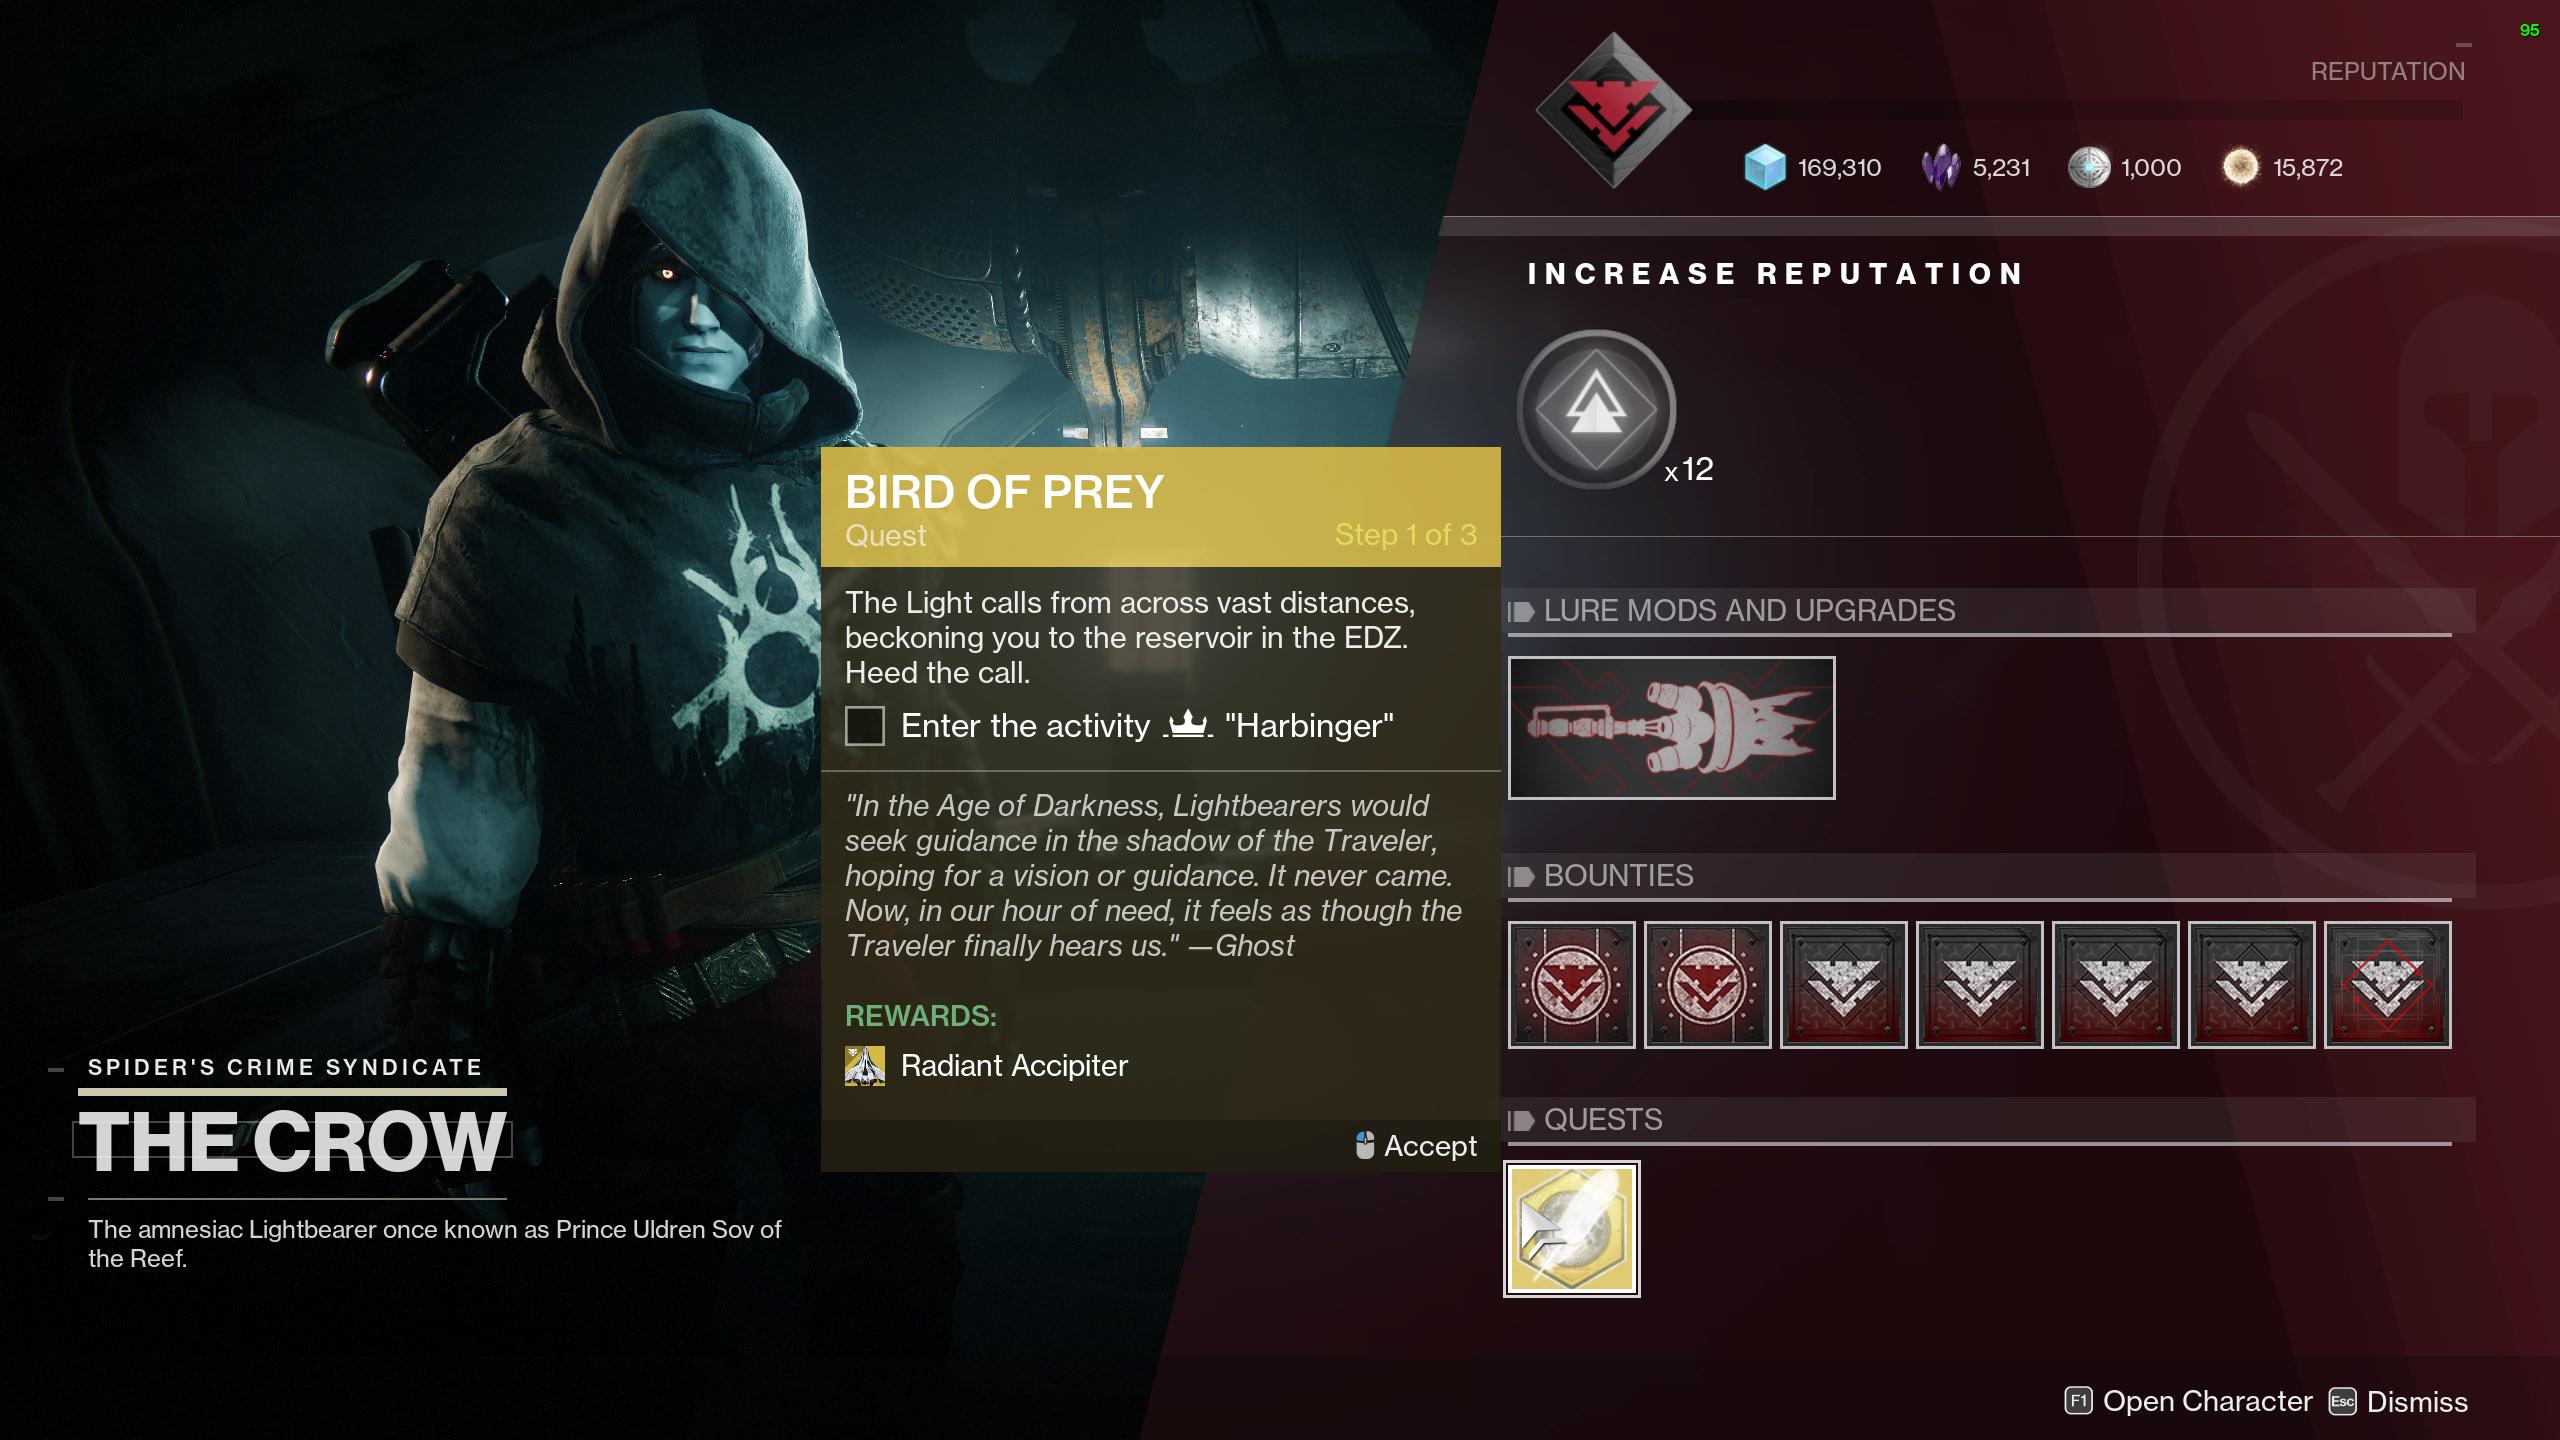 destiny 2 bird of prey quest